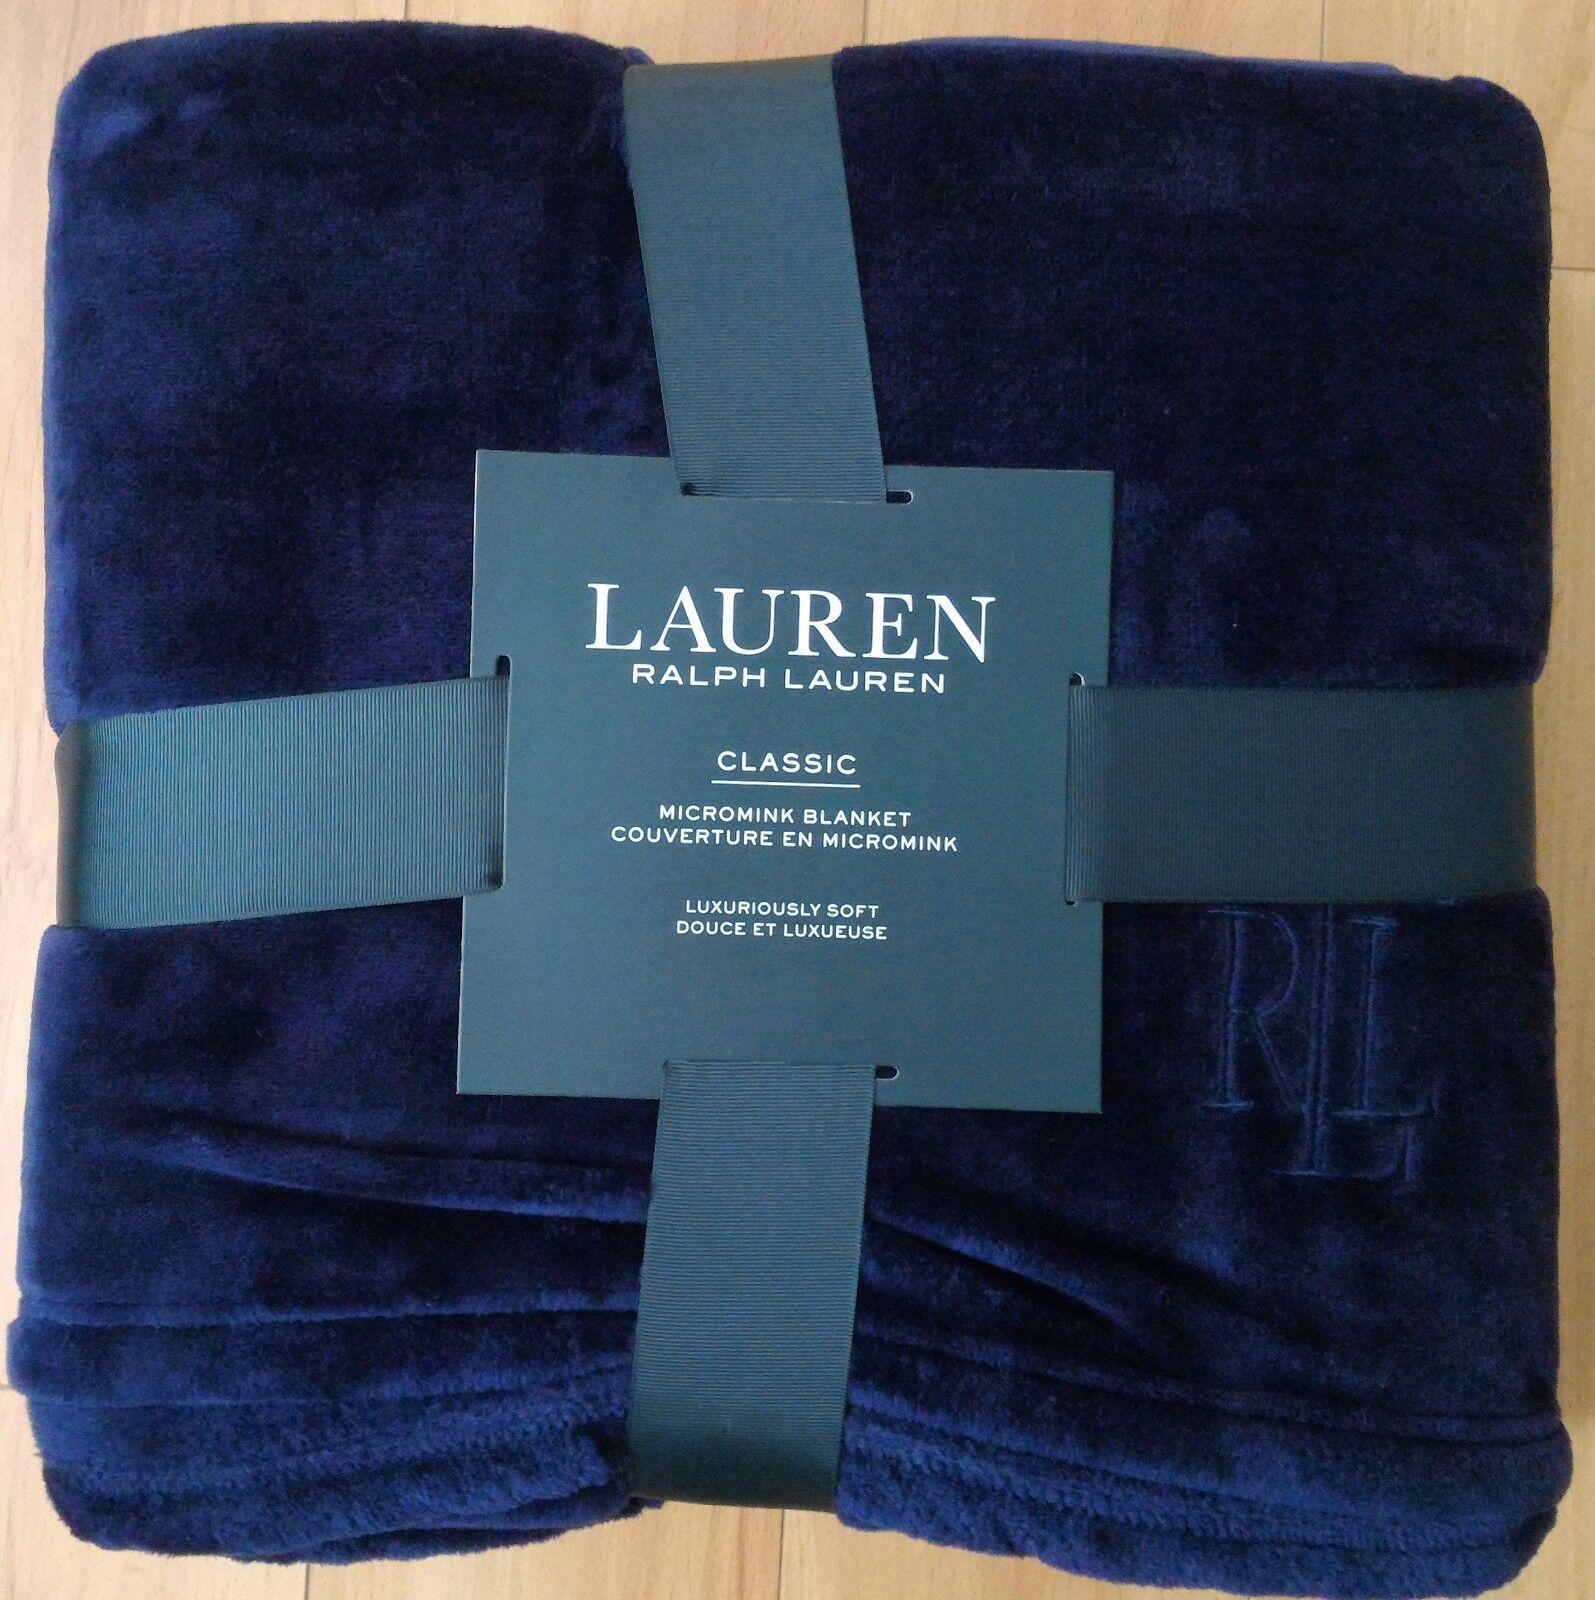 Ralph Lauren Blanket FULL QUEEN Micromink Classic Luxurious Plush 90x90 bluee